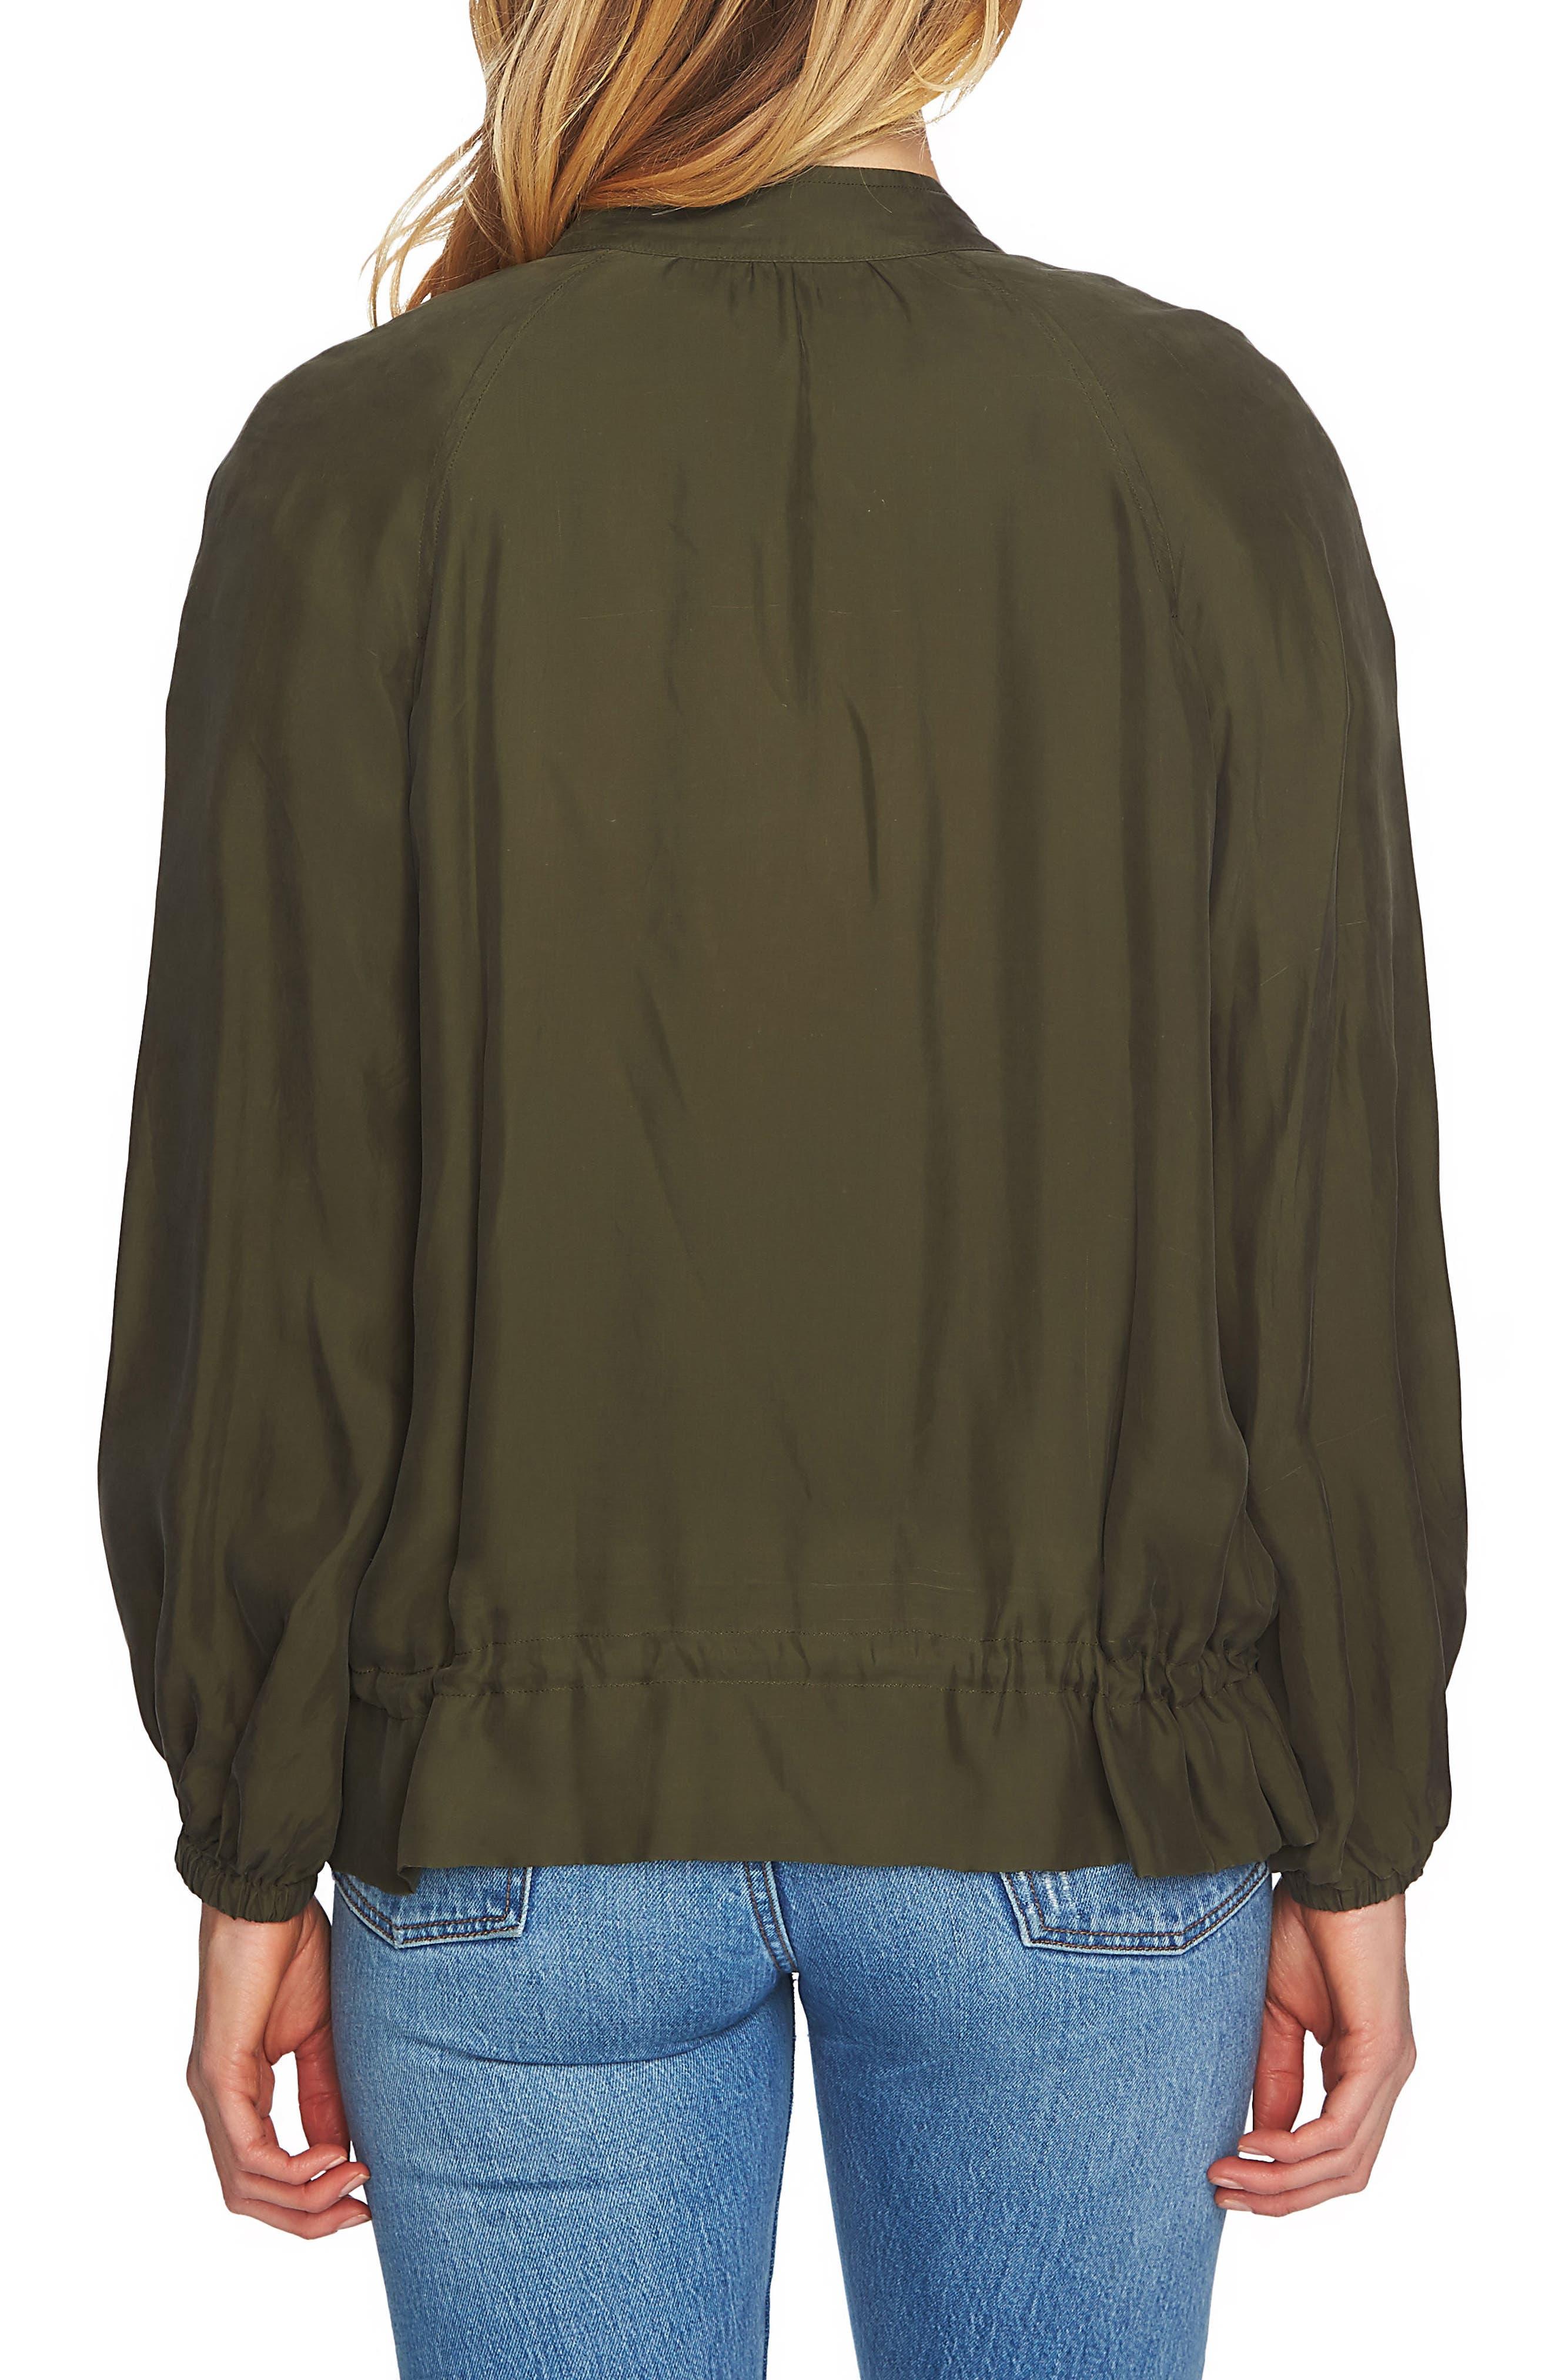 Blouson Sleeve Bomber Jacket,                             Alternate thumbnail 2, color,                             Olive Tree